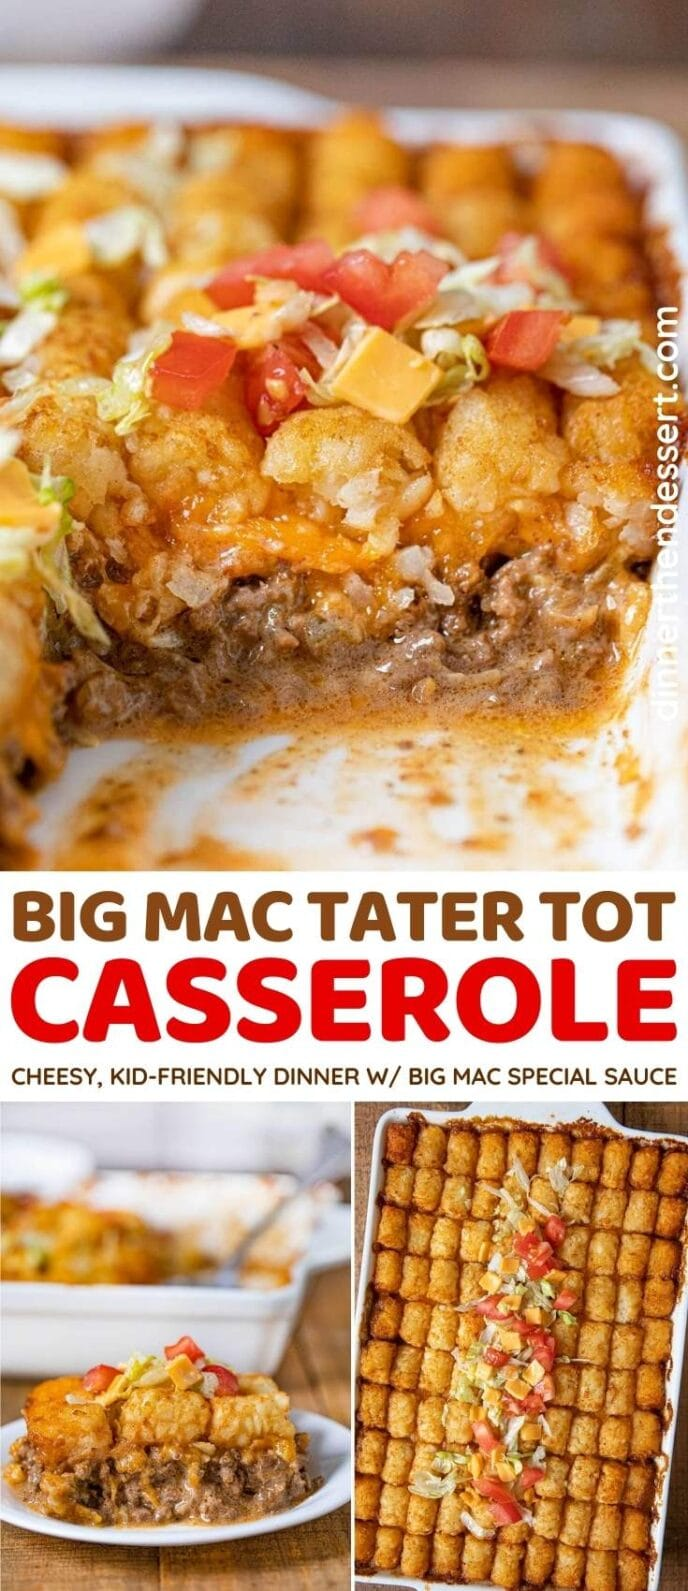 Big Mac Tater Tot Casserole collage